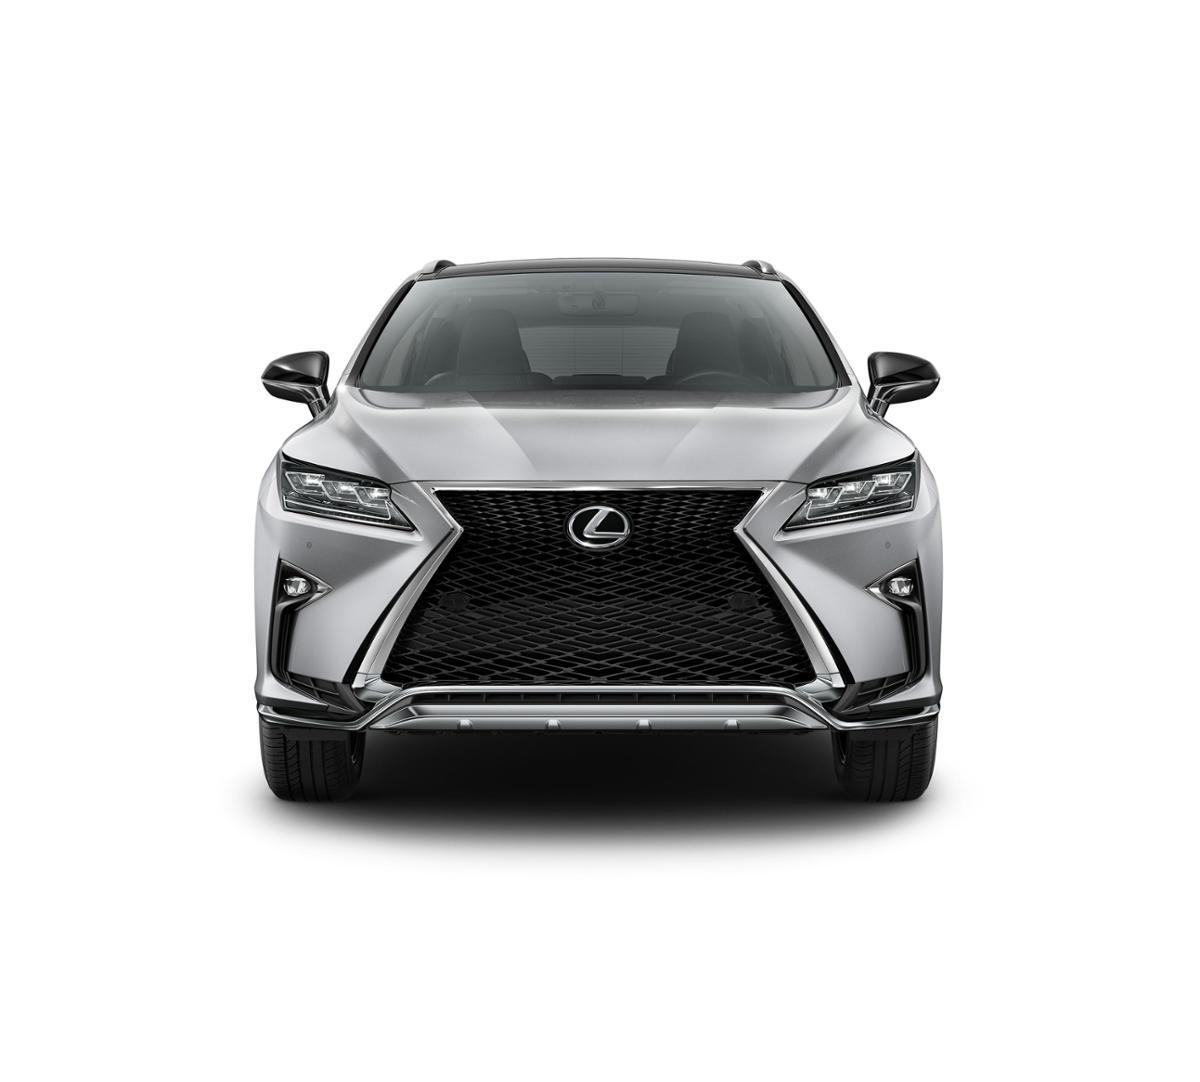 Cadillac Dealership Orlando Fl: 2018 Lexus RX 350 Silver Lining Metallic : New Suv For Sale